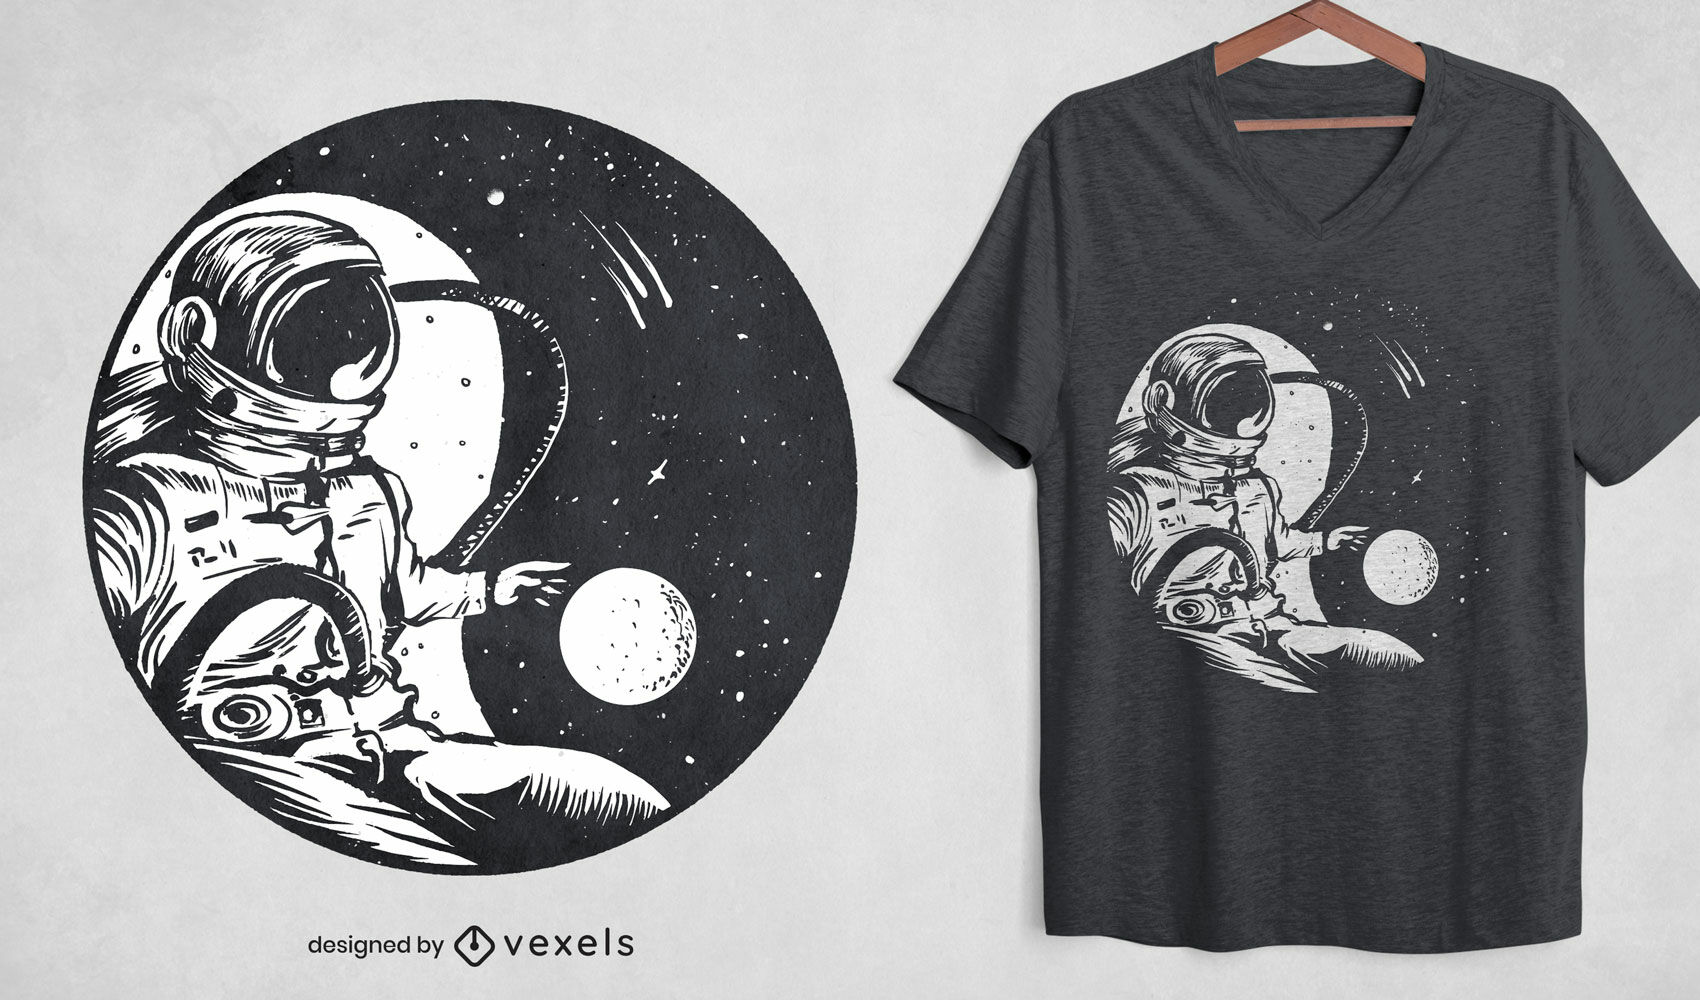 Diseño de camiseta espacial astronauta yin yang.